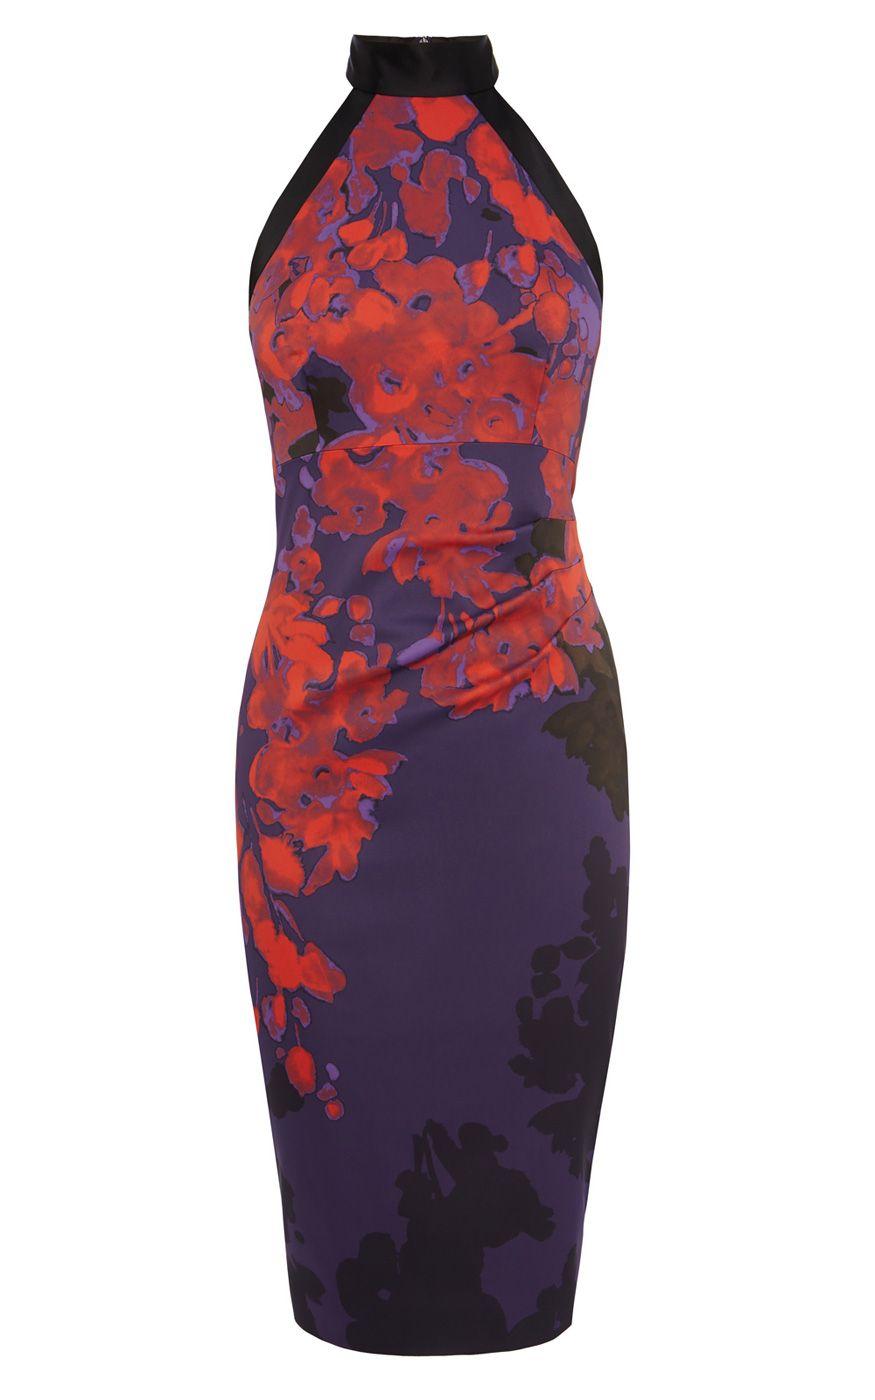 ORIENTAL FLORAL PRINT PENCIL DRESS   Luxury Women\'s dresses   Karen ...